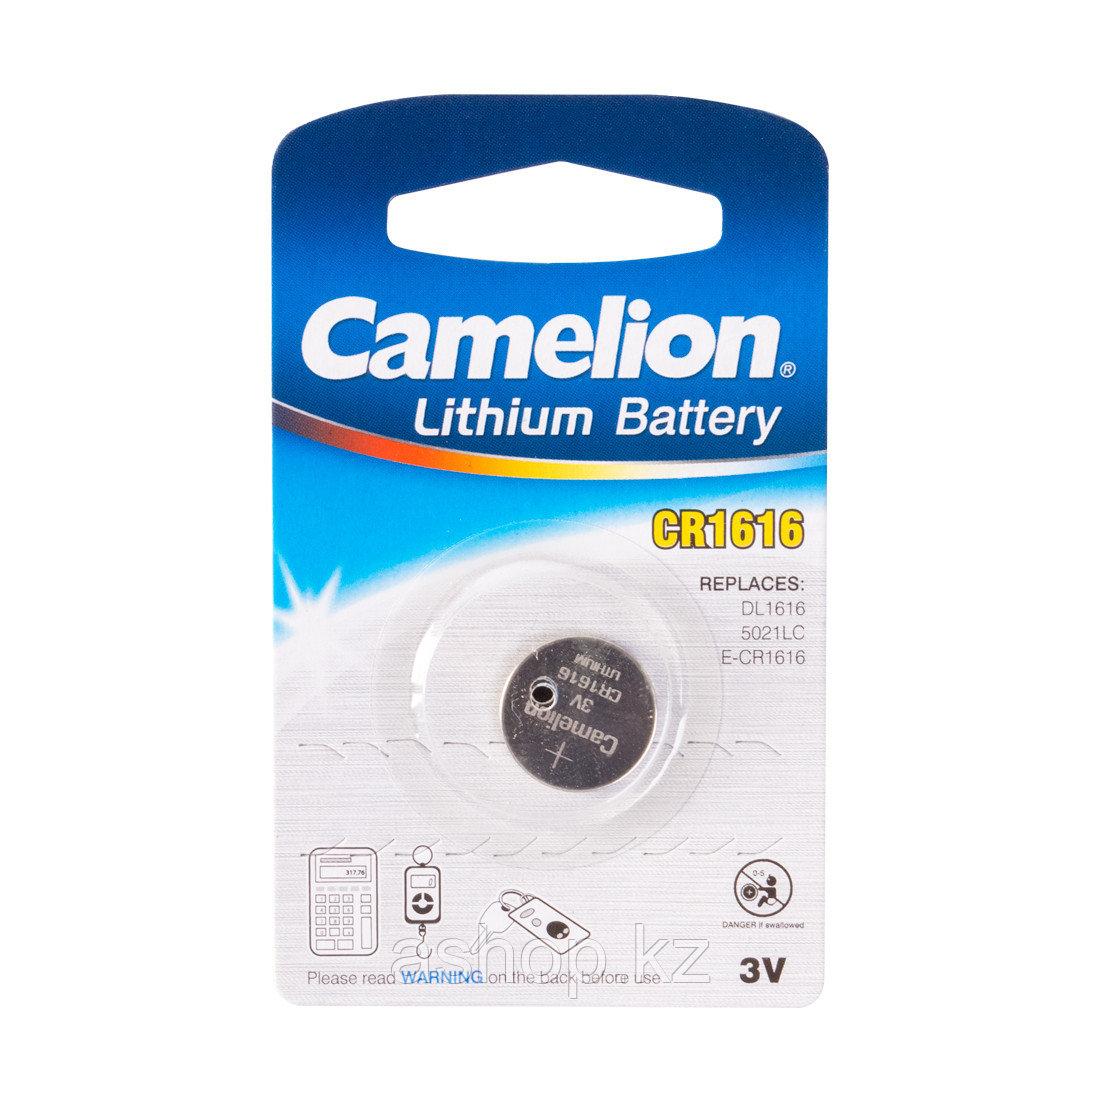 Батарейка Camelion CR1616-BP1 3 В, Упакова: Блистер 1 шт., Аналоги: CR1616\5021LC, Тип батареи: Литий-ионный